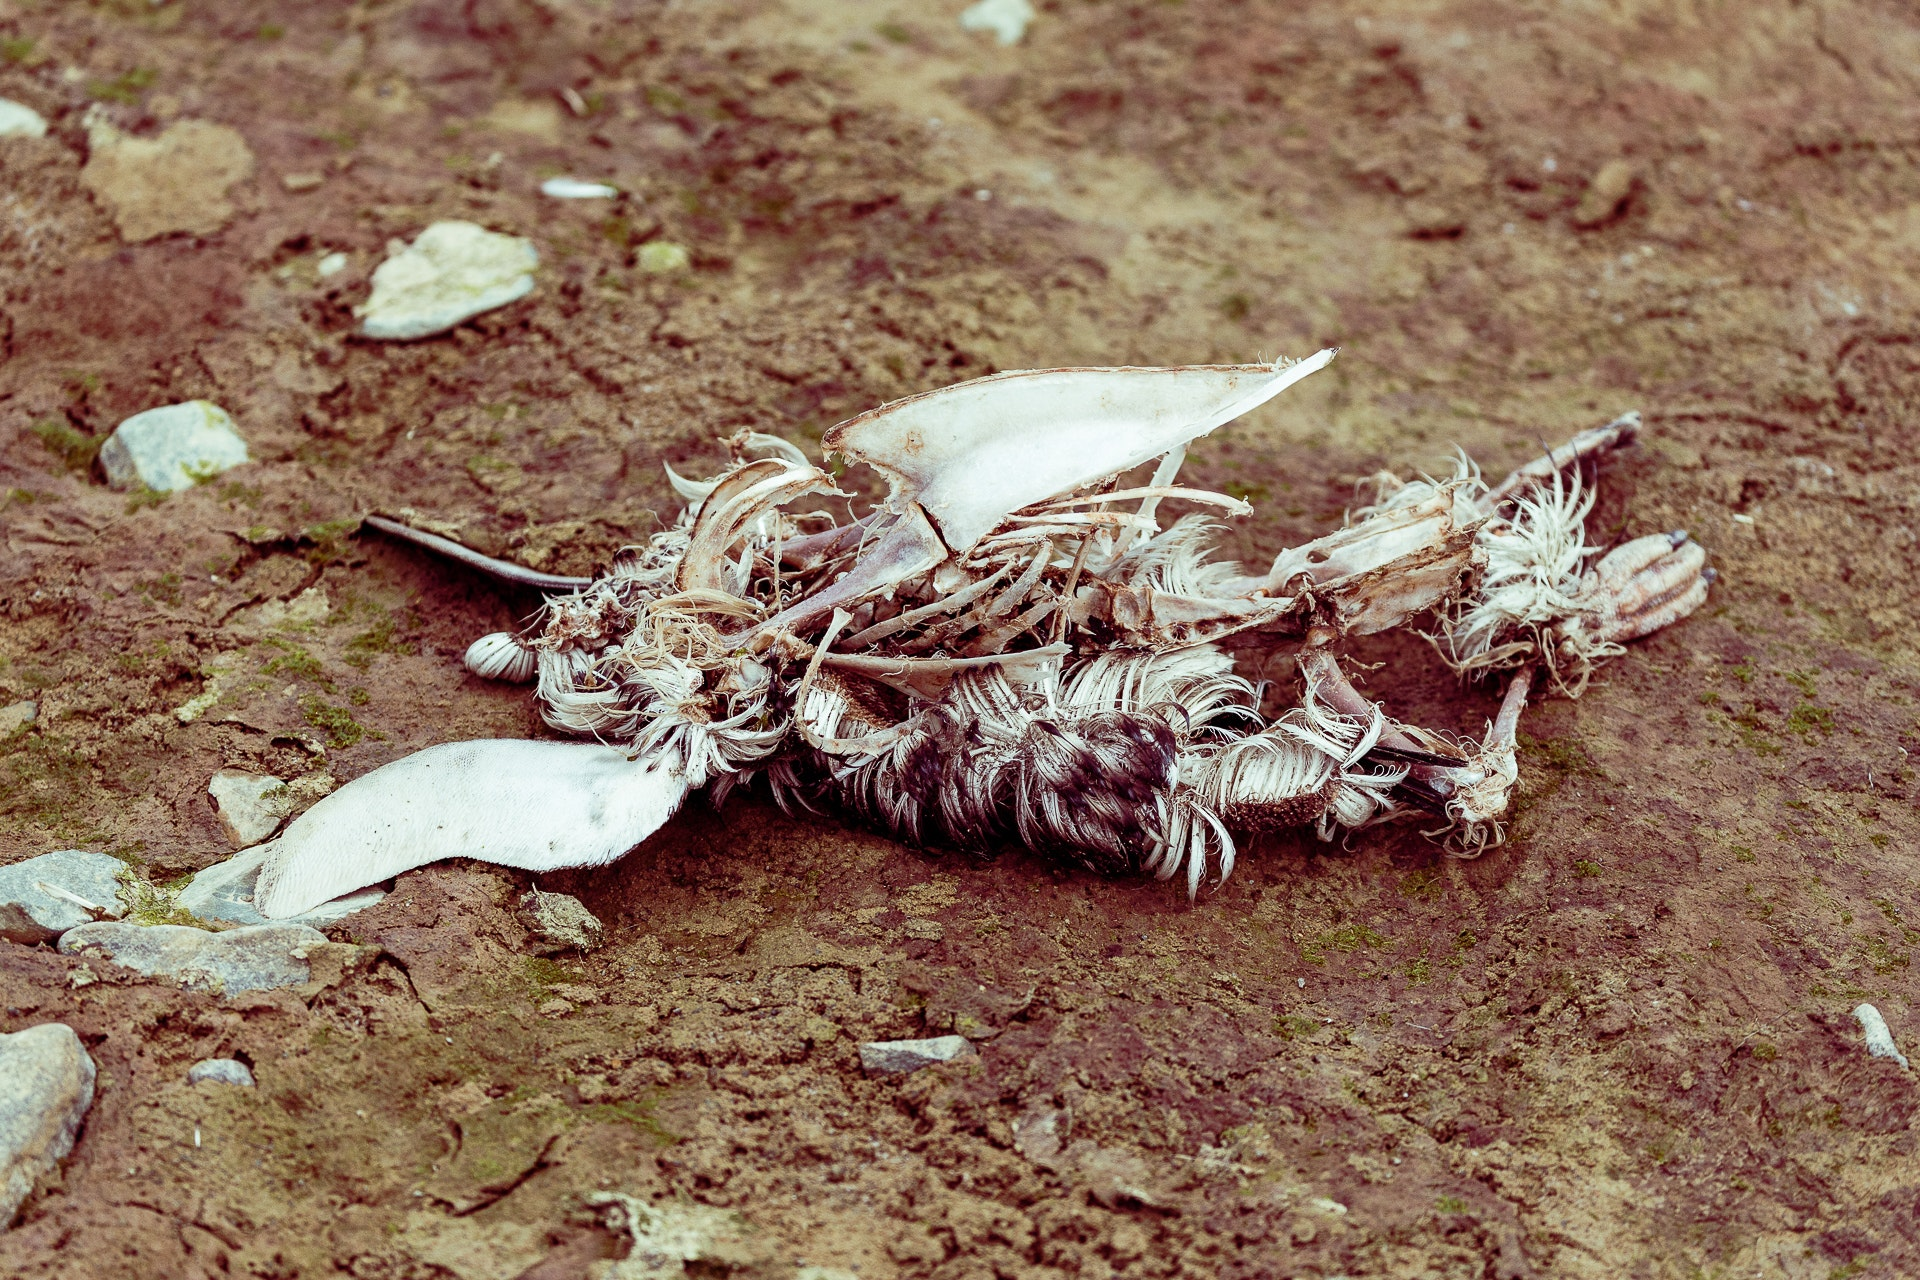 Penguin corpse